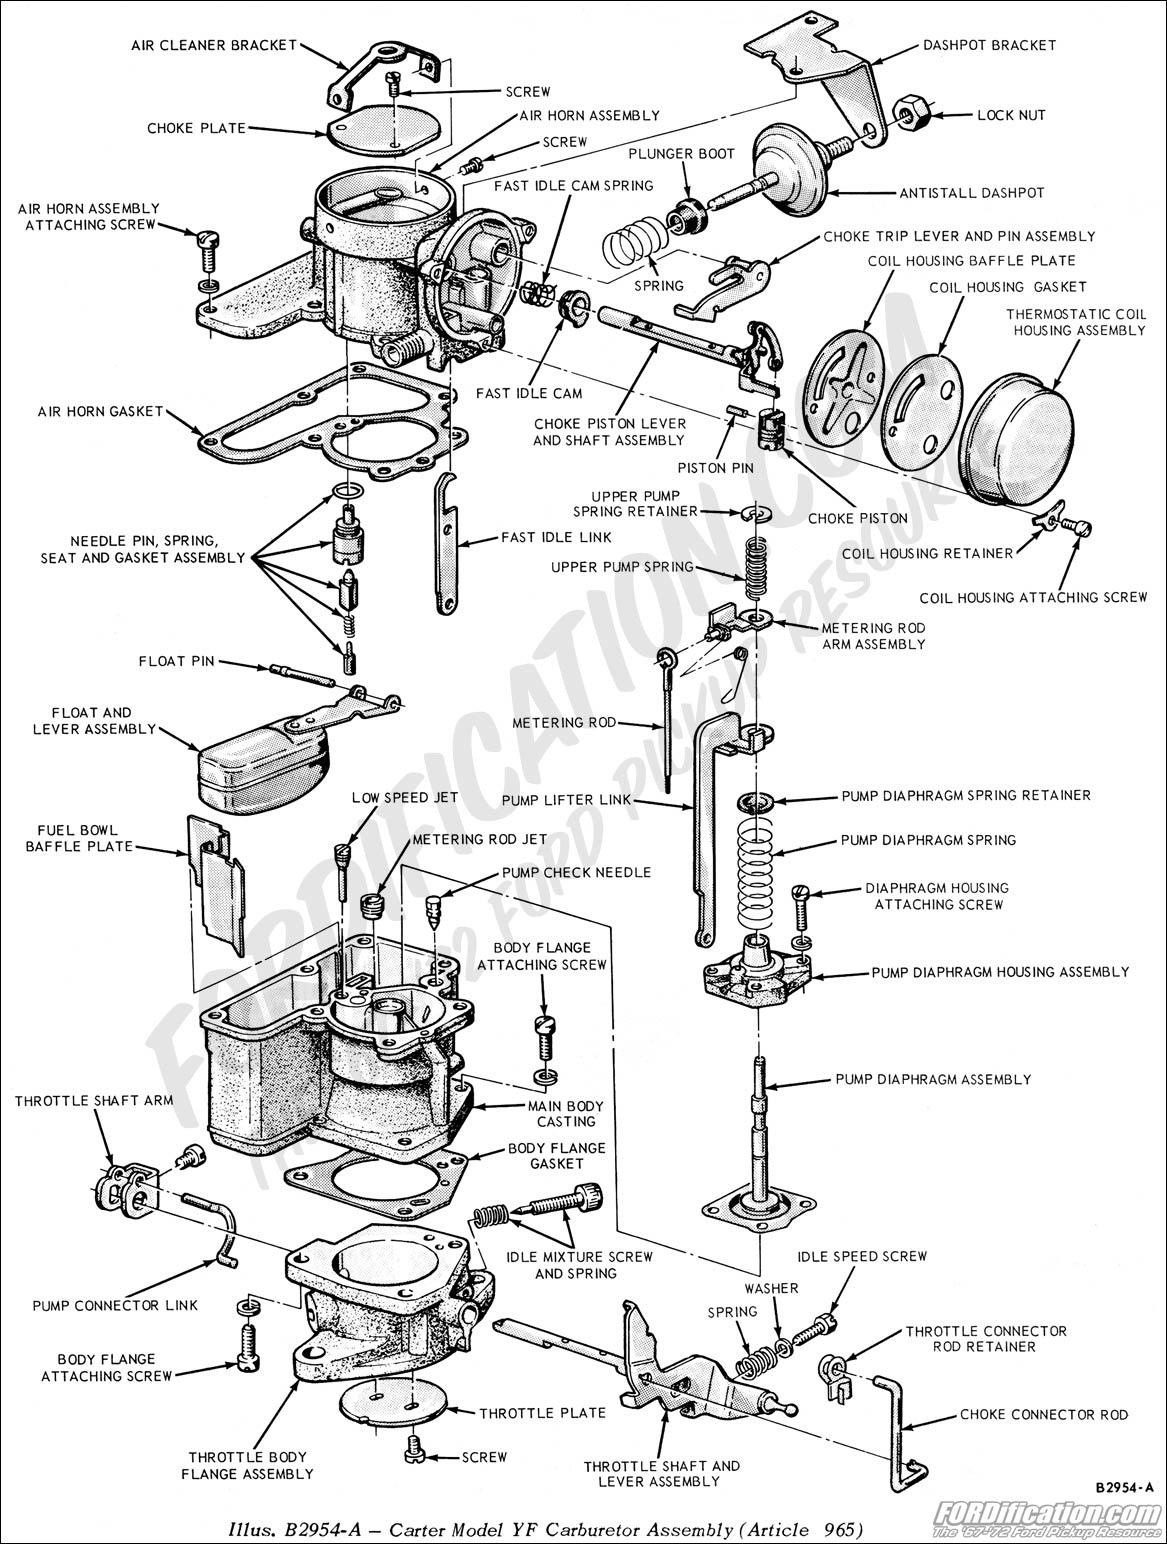 Carter W 1 Carburetor